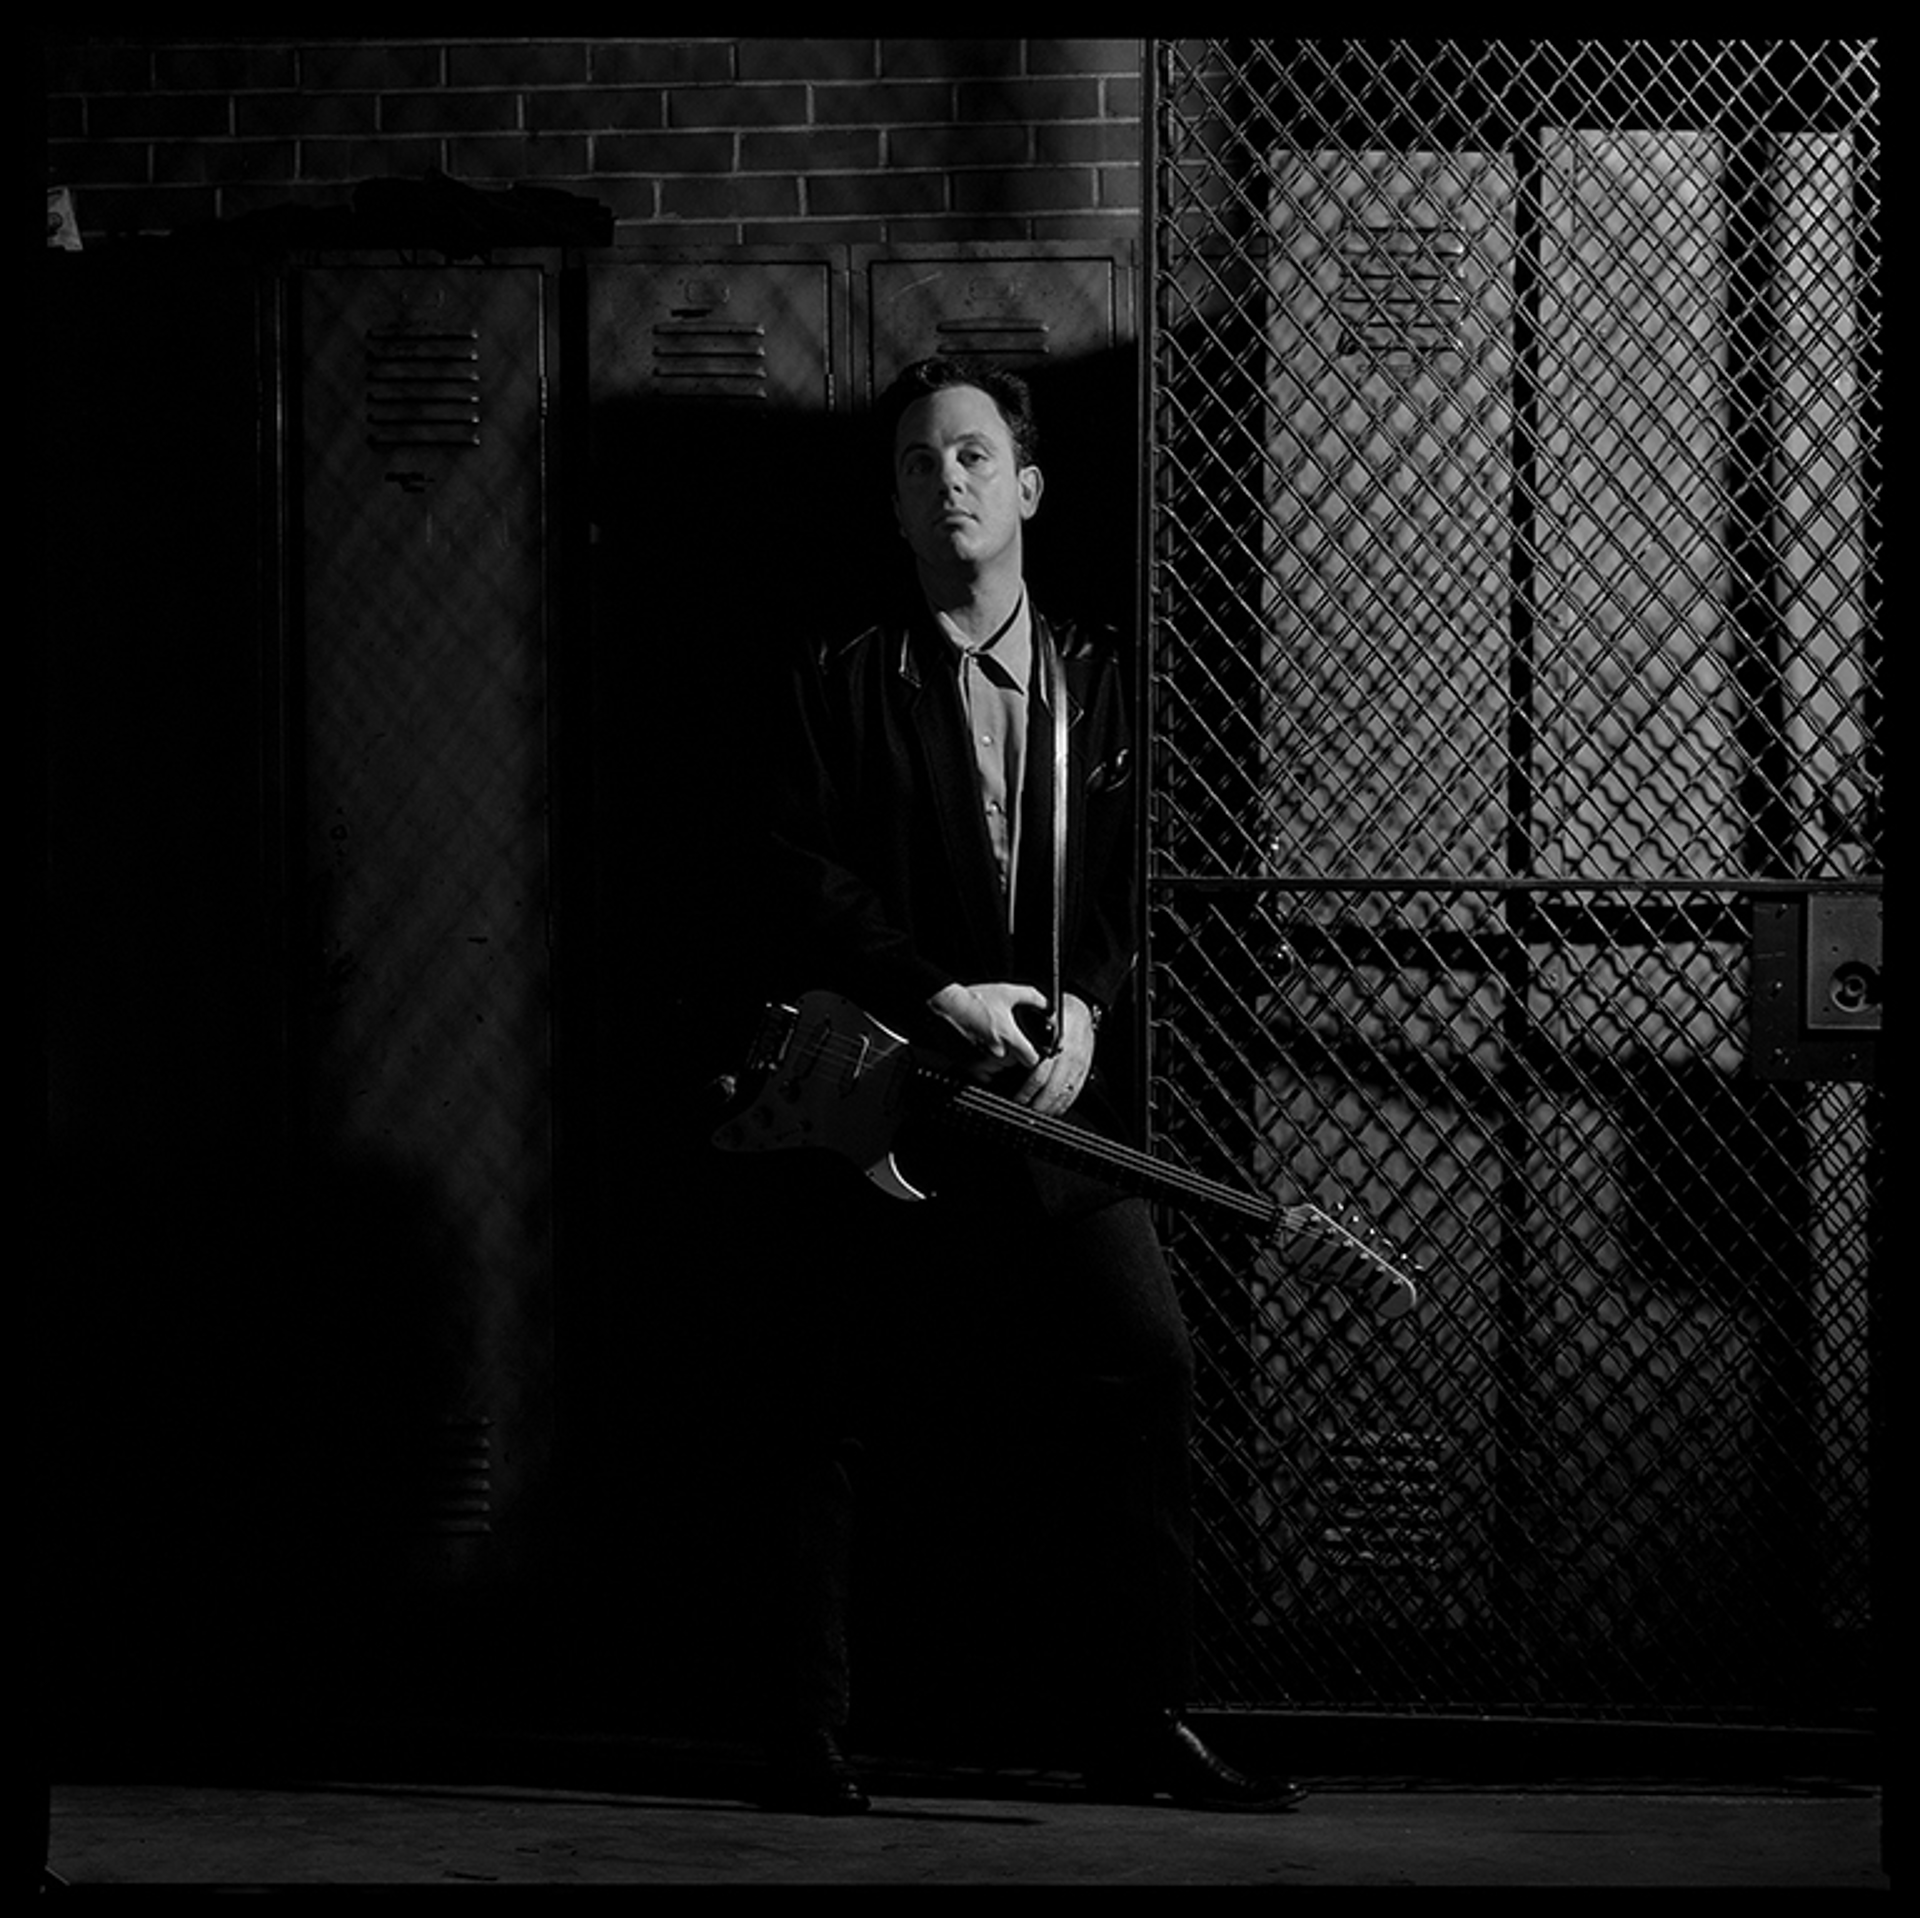 89196 Billy Joel Locker Room BW by Timothy White